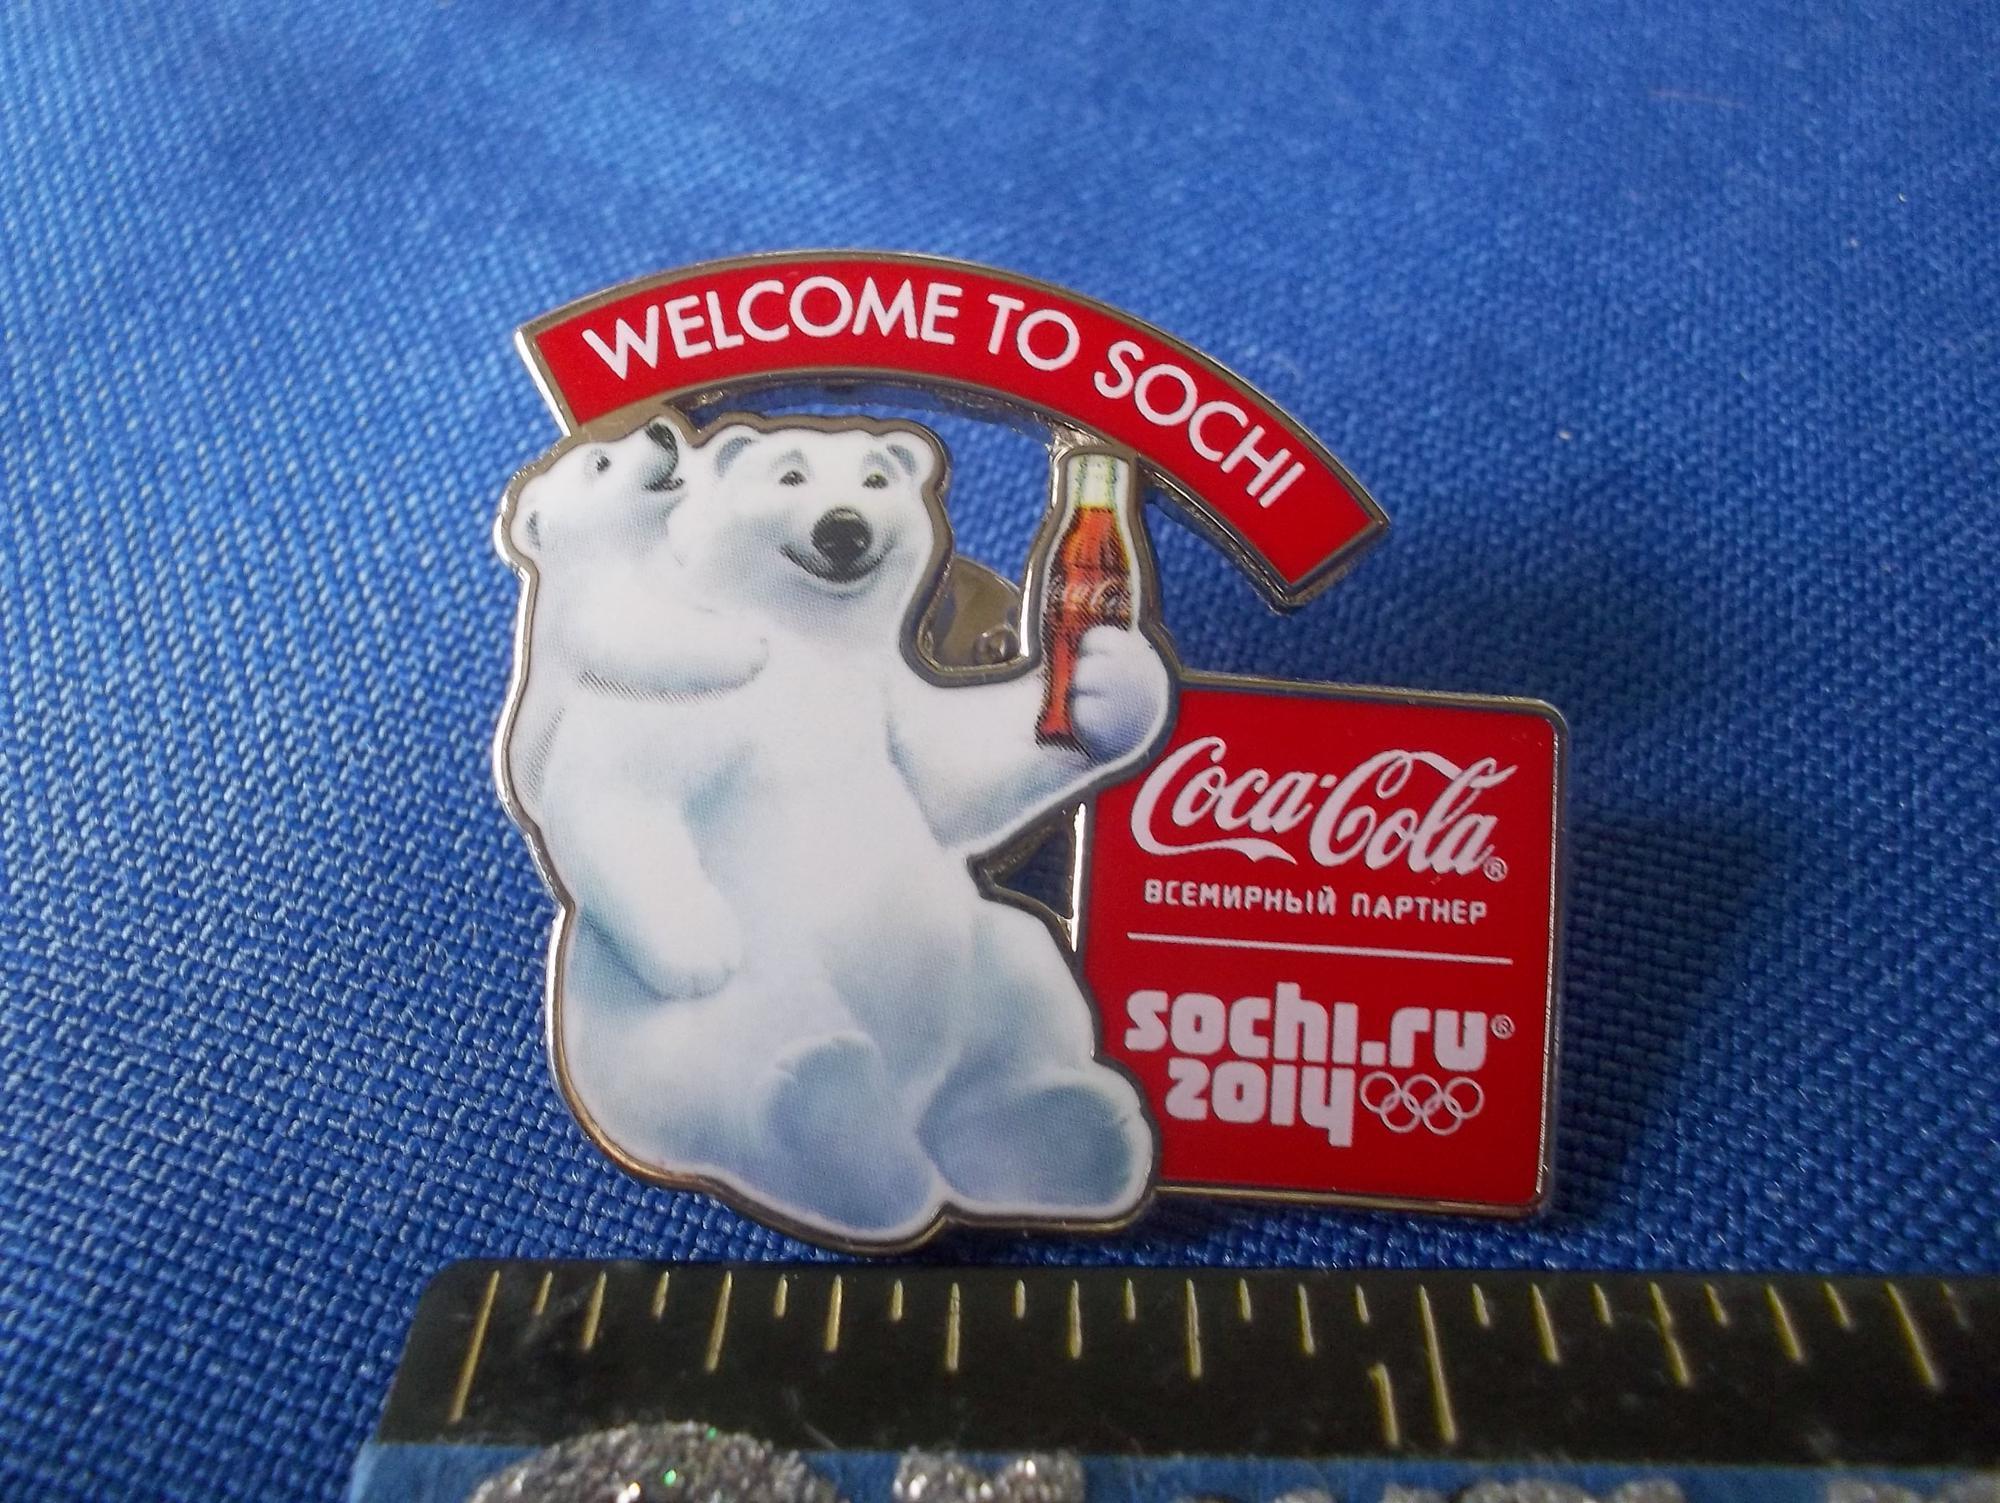 Sochi.ru 2014 Welcome To Sochi Coca-Cola Polar Bear Holding Coke